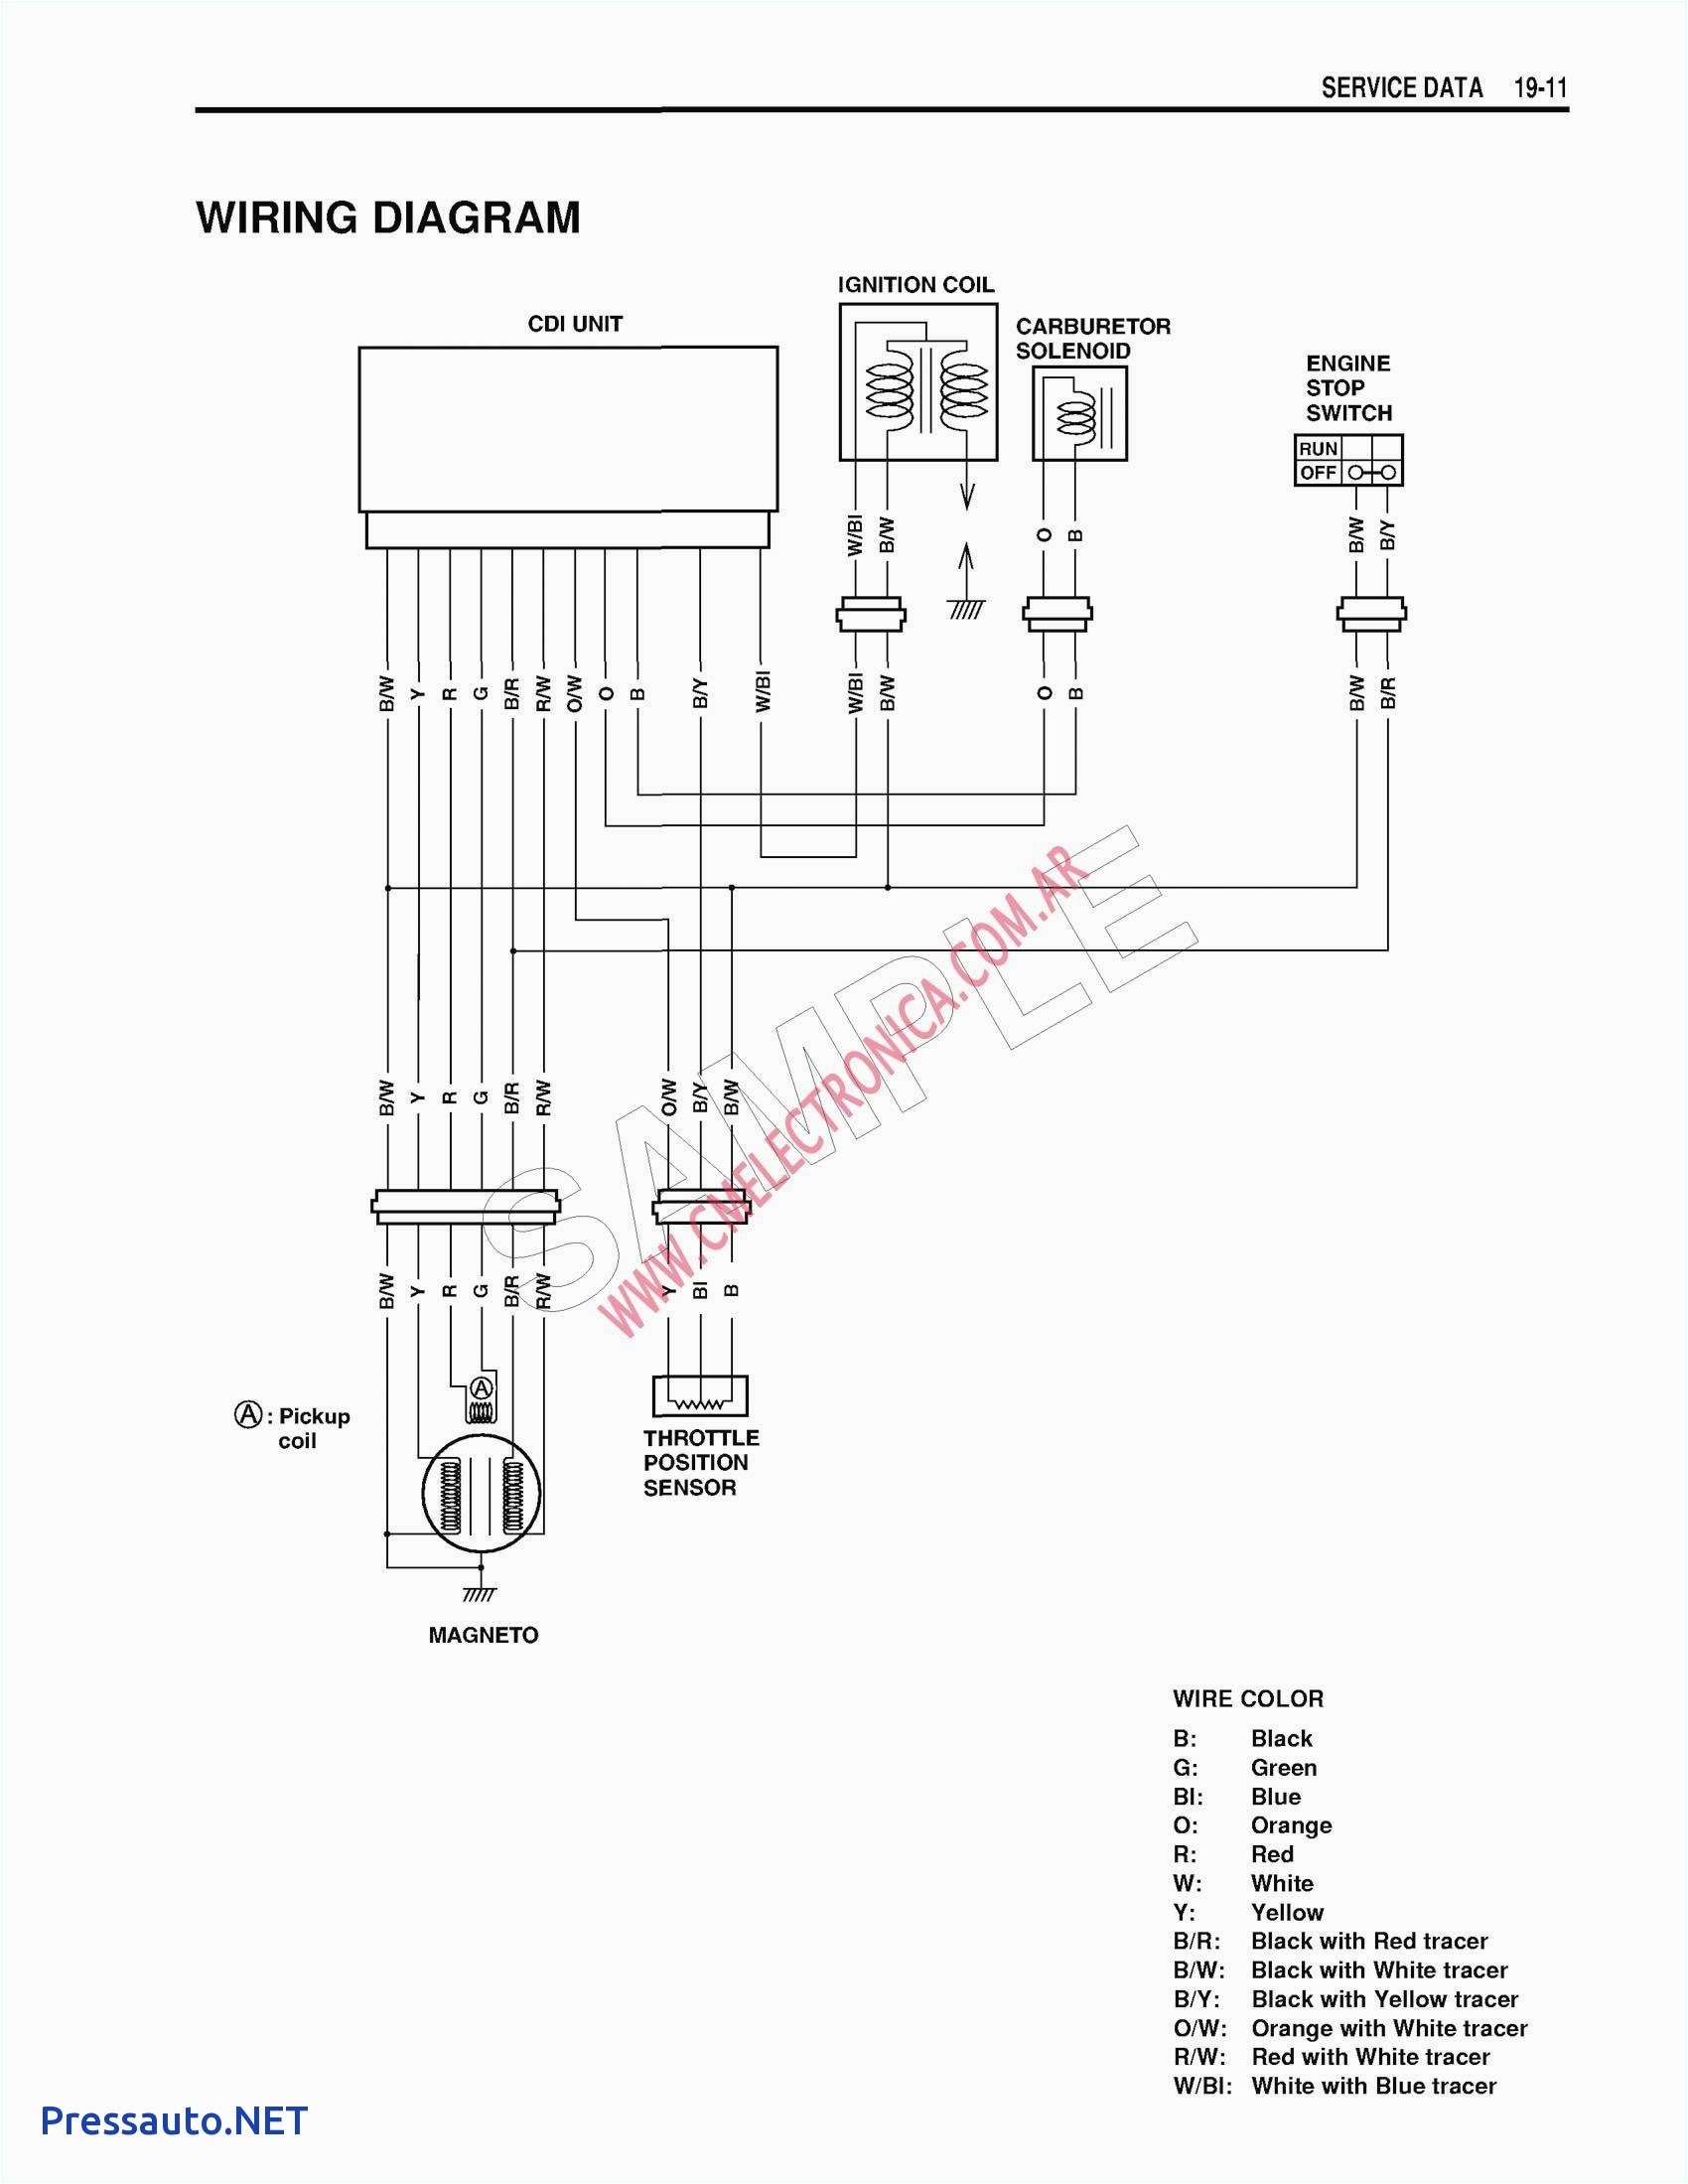 5 pin cdi ignition wiring diagram 150cc wiring diagram centre 6 wire cdi wiring diagram wiring